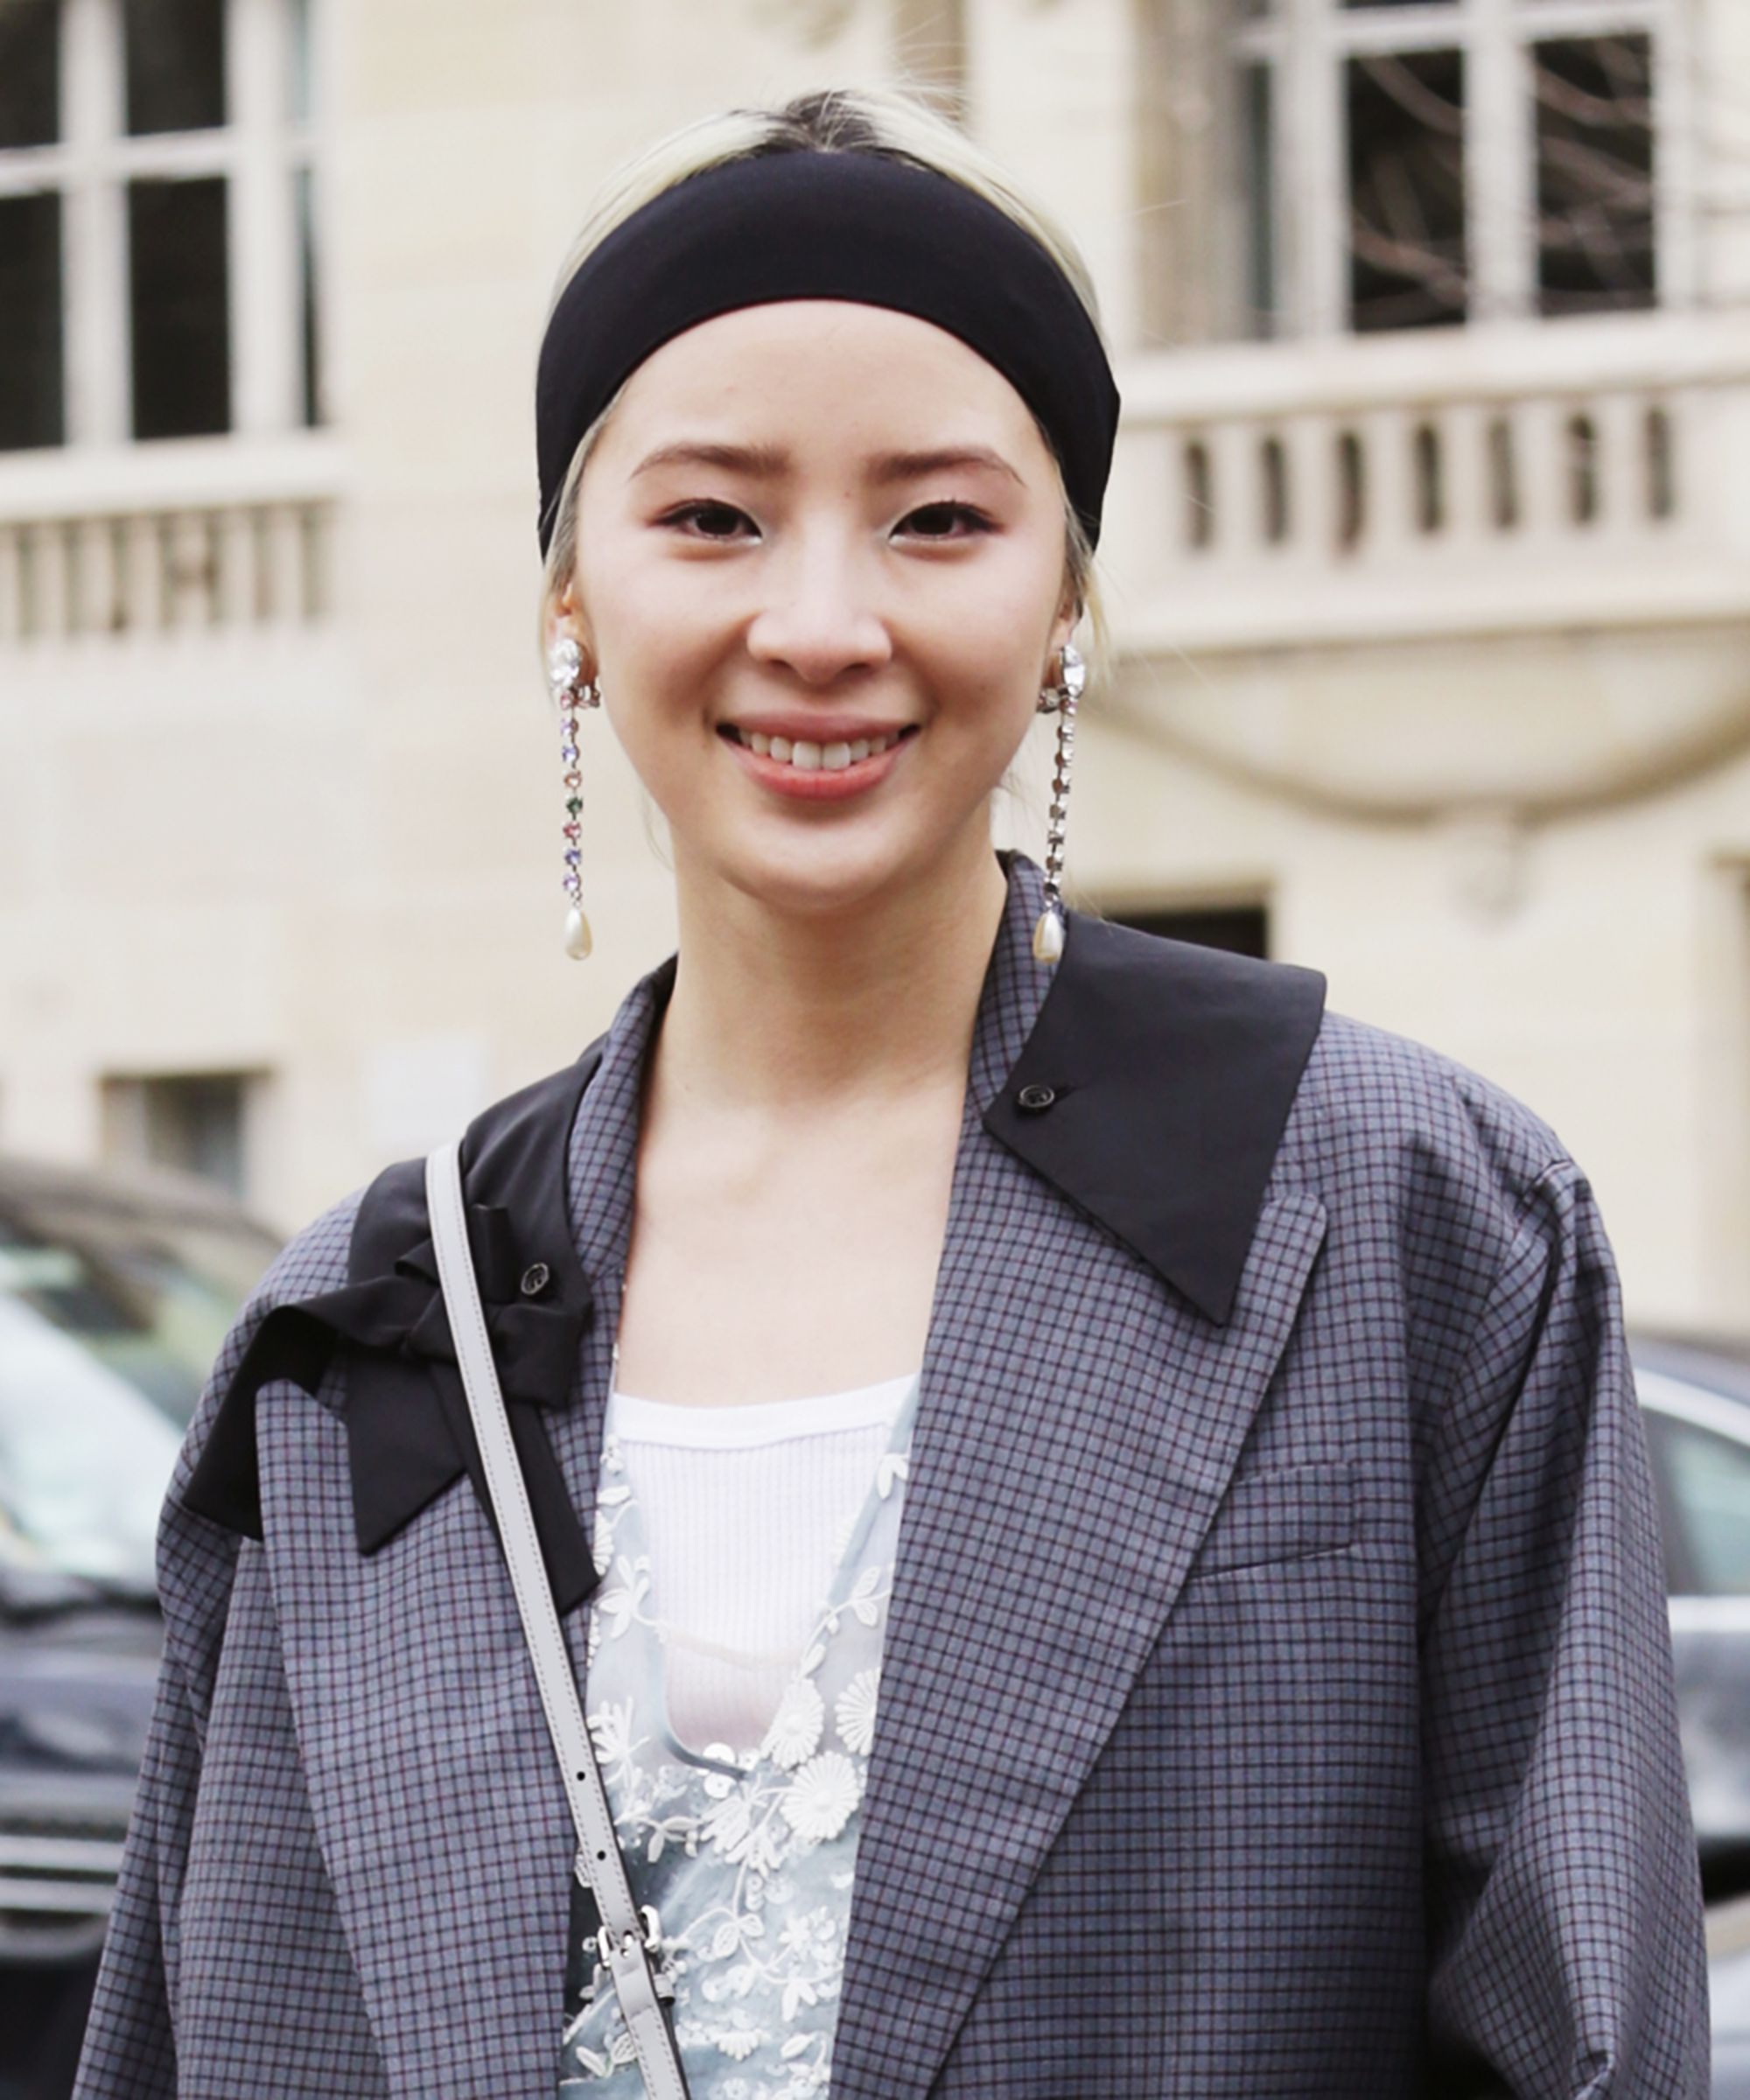 wide-how-to-style-hair-accessories-headbands-hairstyles-ways-to-wear-street-black.jpg